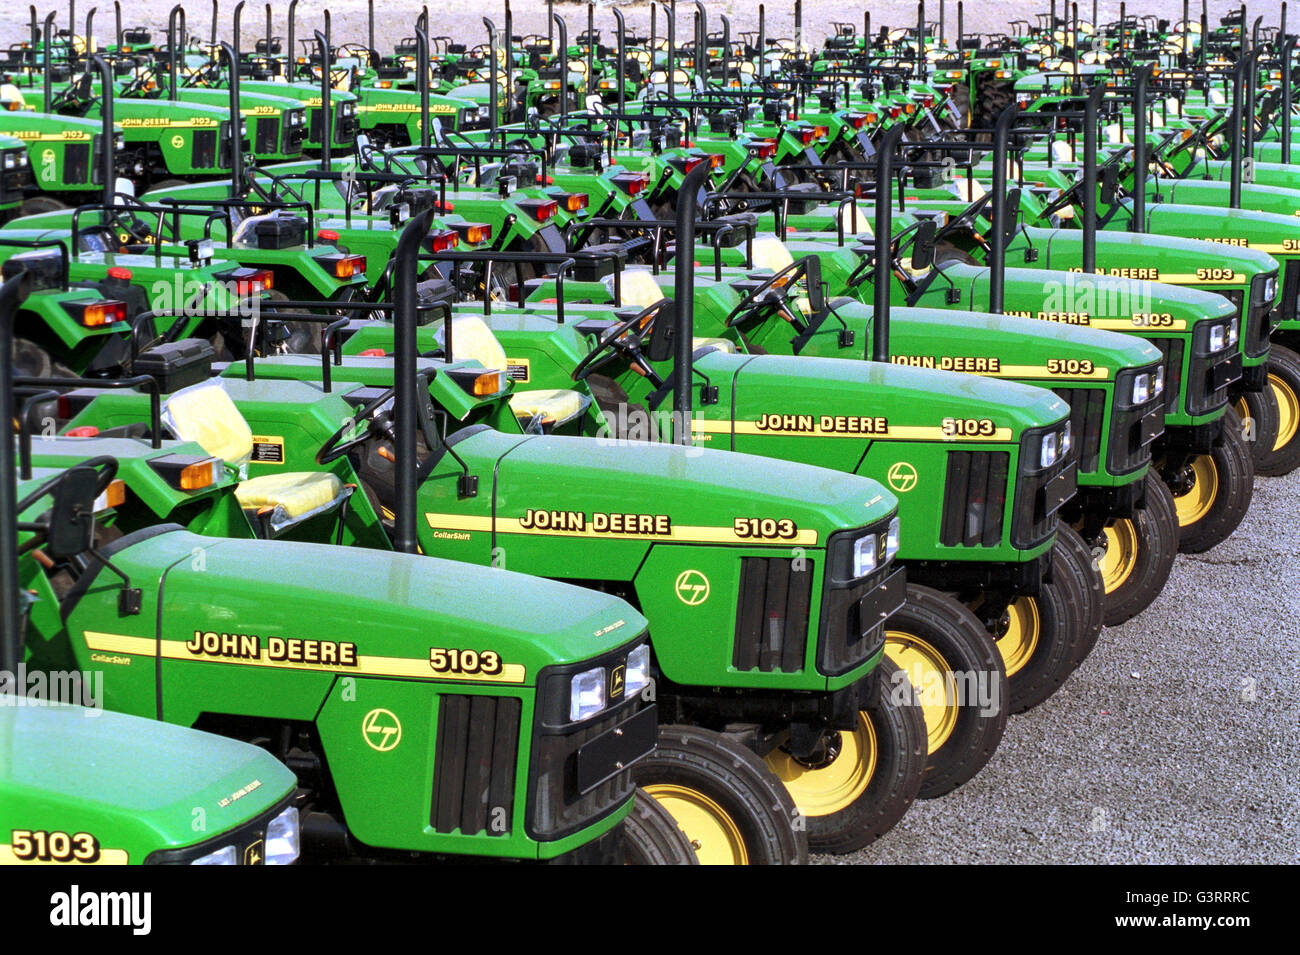 India Pune John Deere Tractor Factory Production Of John Deere  #A49B27